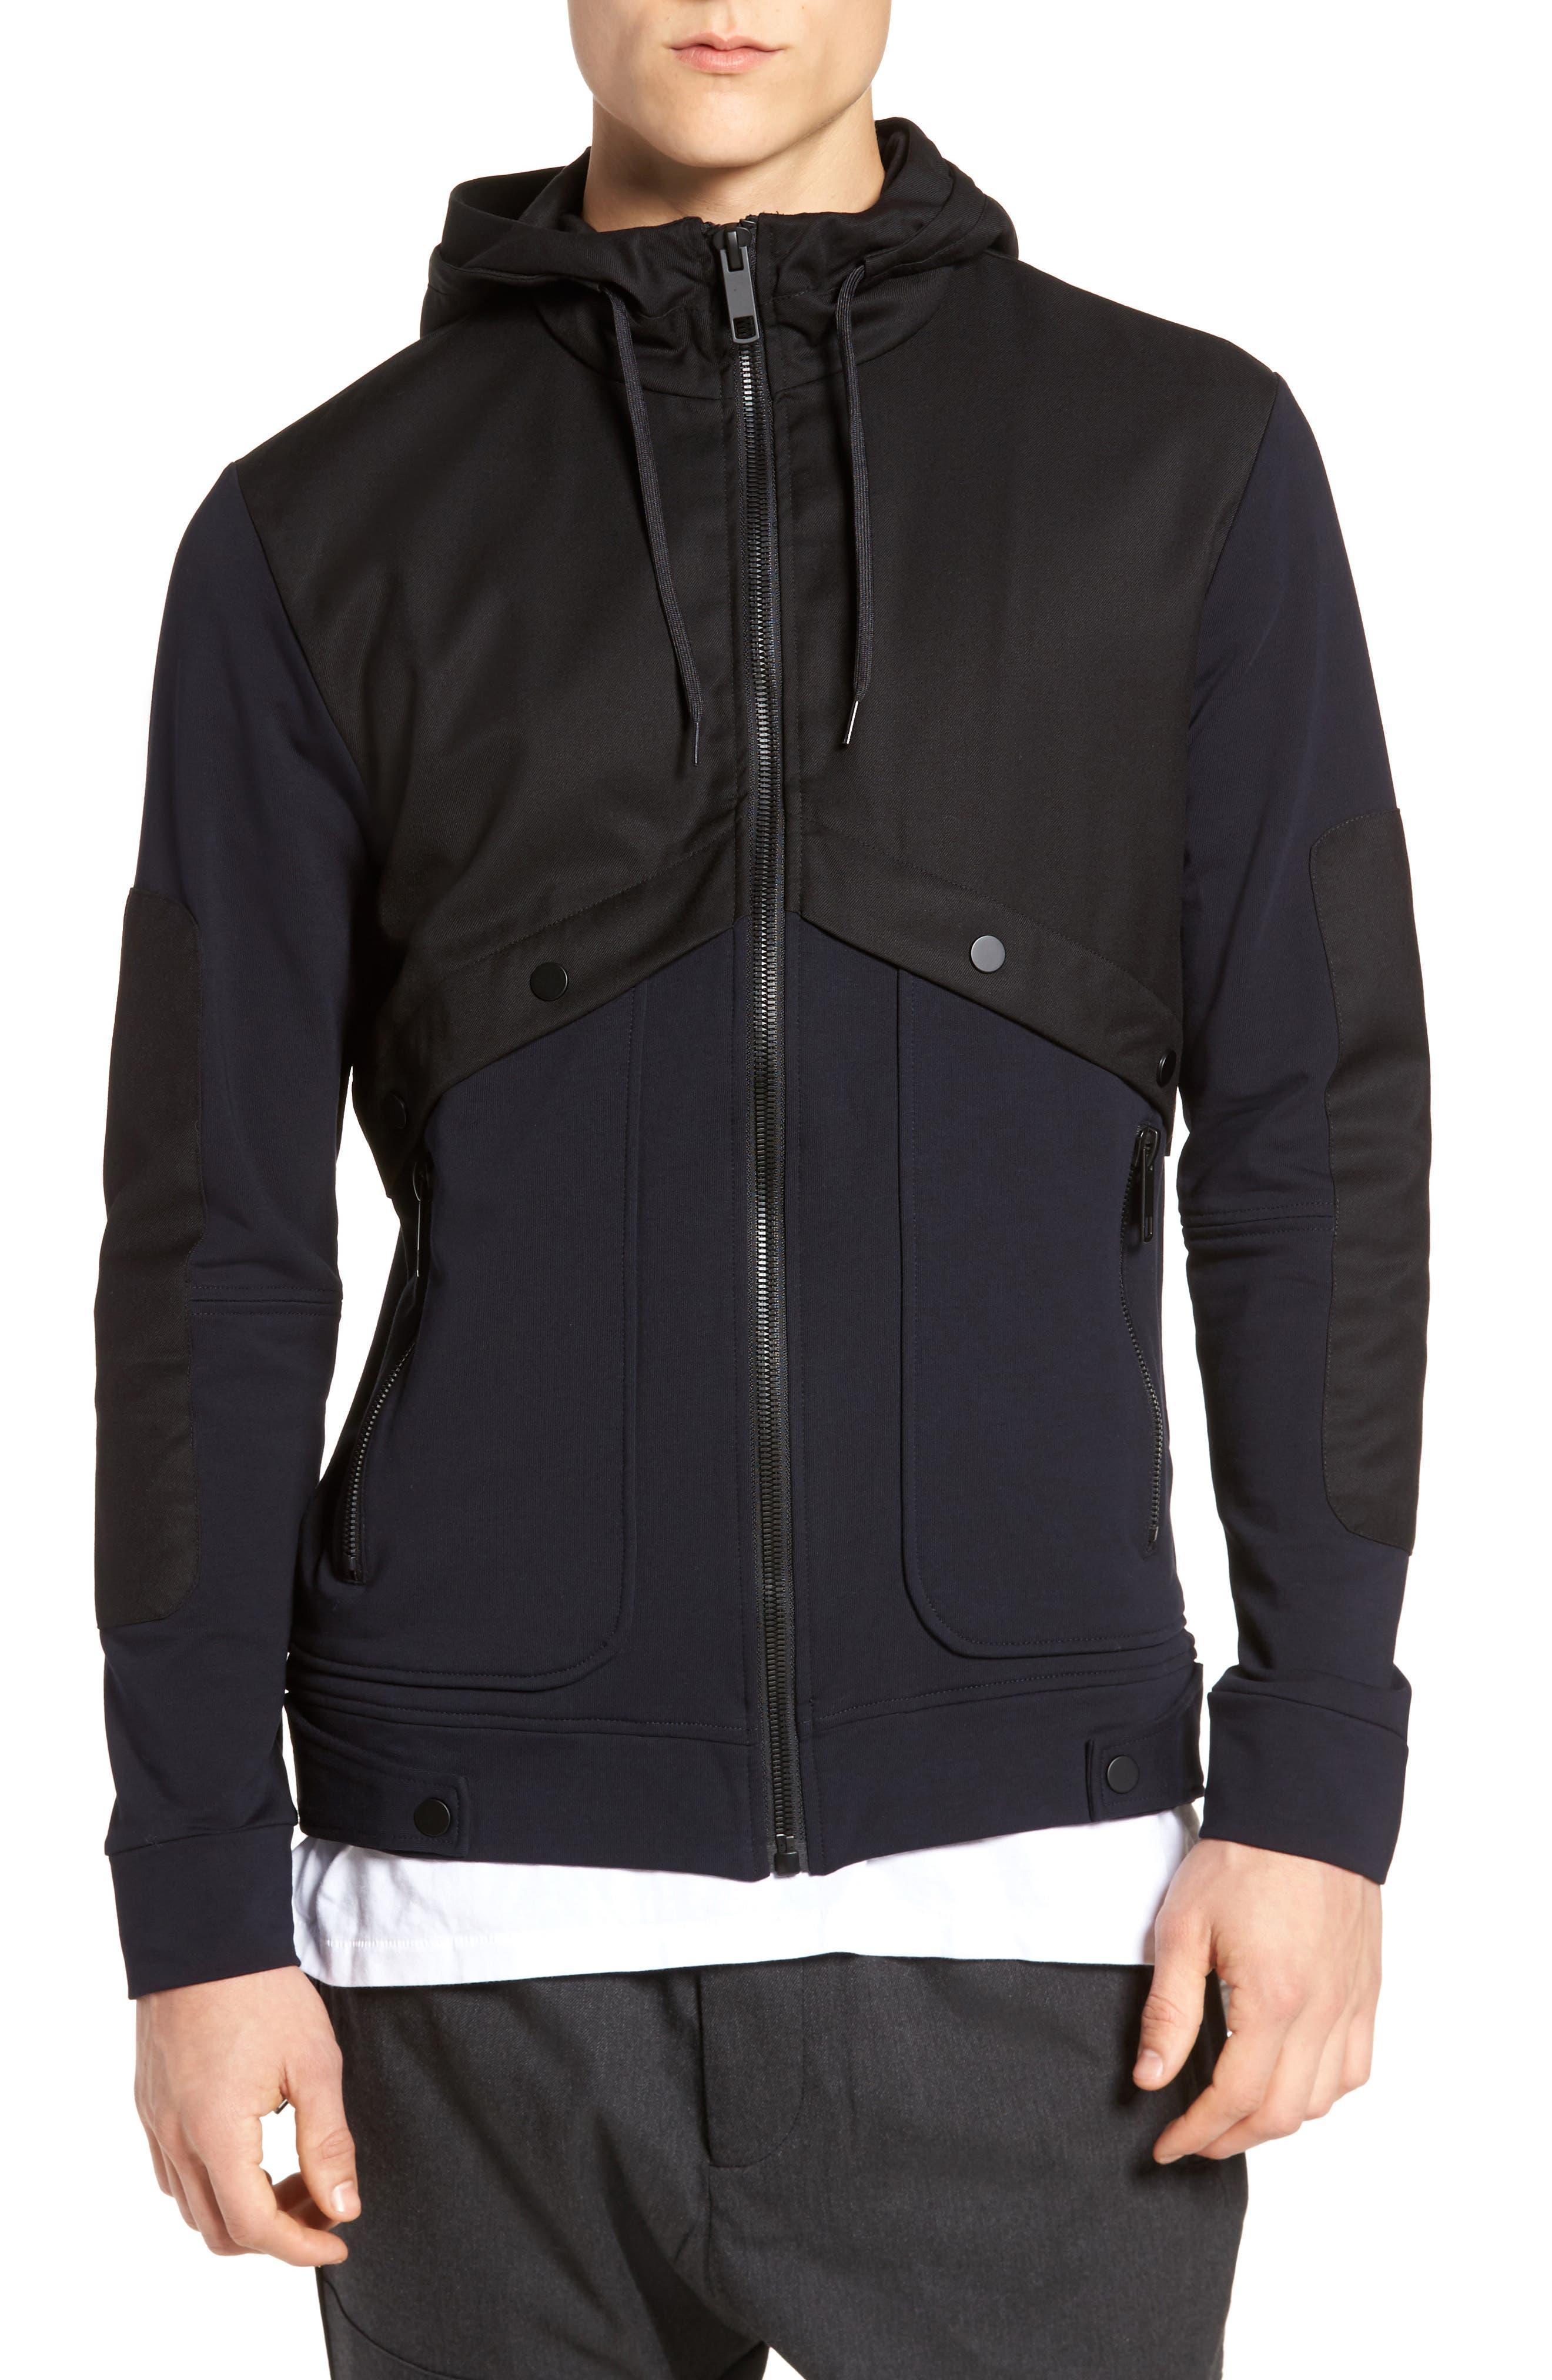 Fleece Zip Up Jacket,                             Main thumbnail 1, color,                             Black